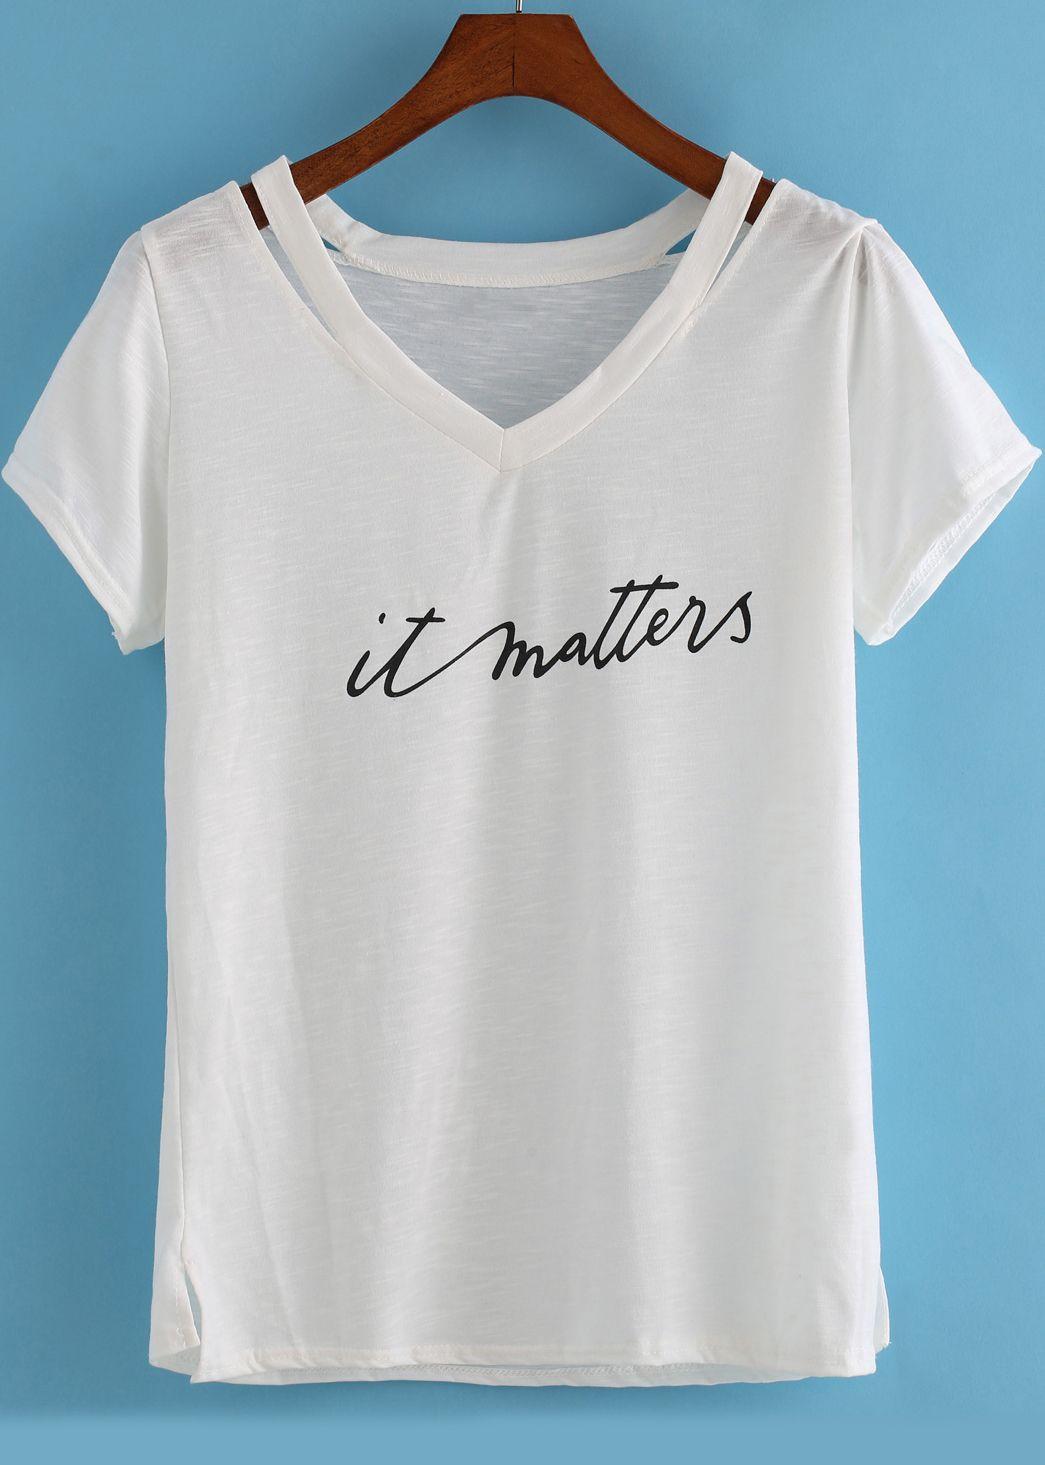 Camiseta cuello V hollow letras -blanca | DIY FASHION - MODA - ROPA ...